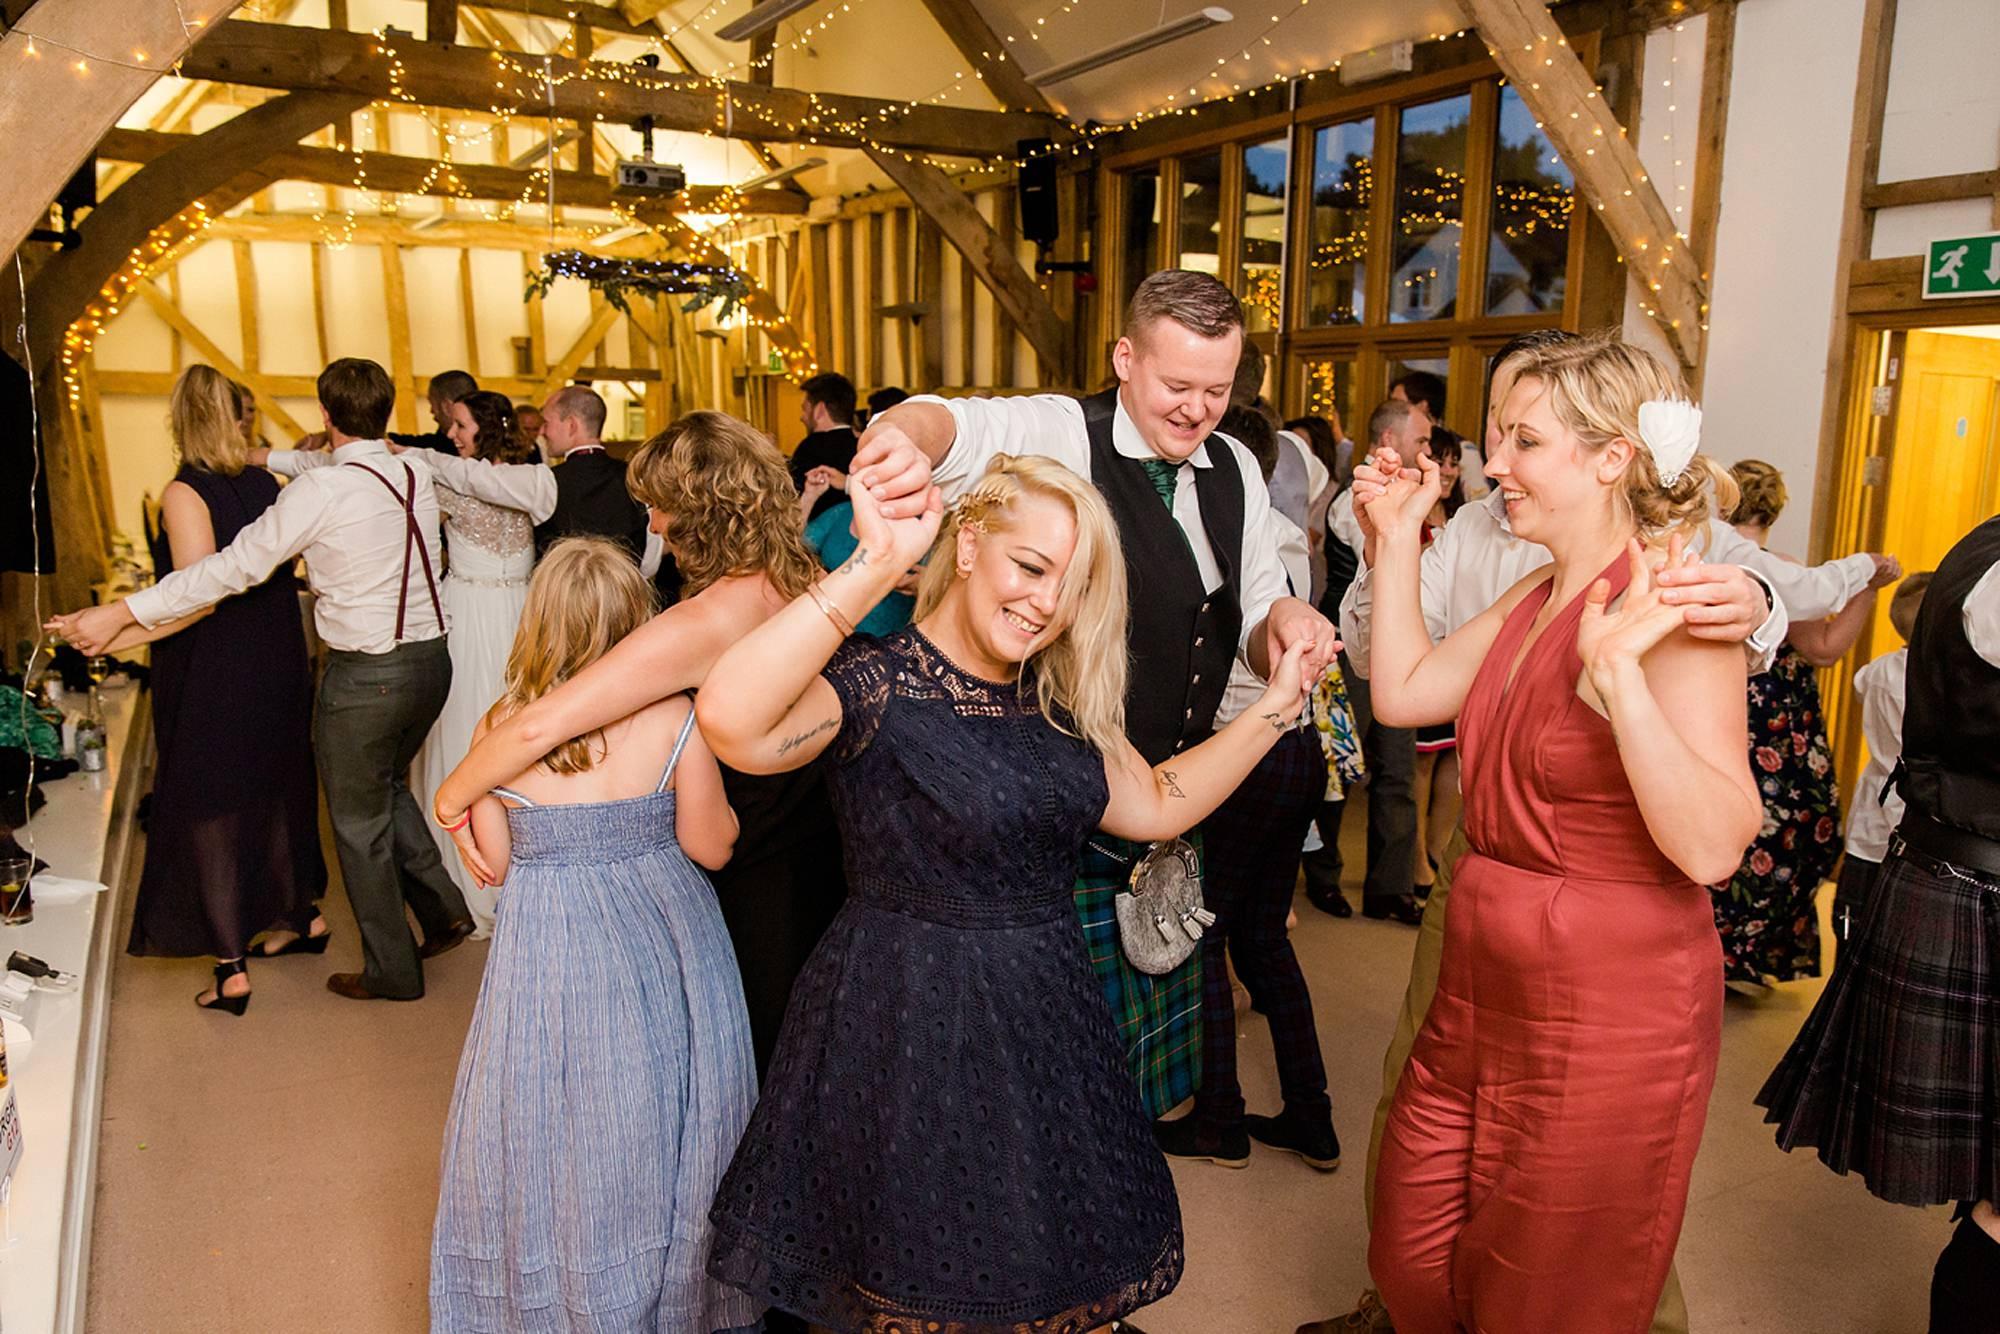 Outdoor humanist wedding photography wedding guests dancing